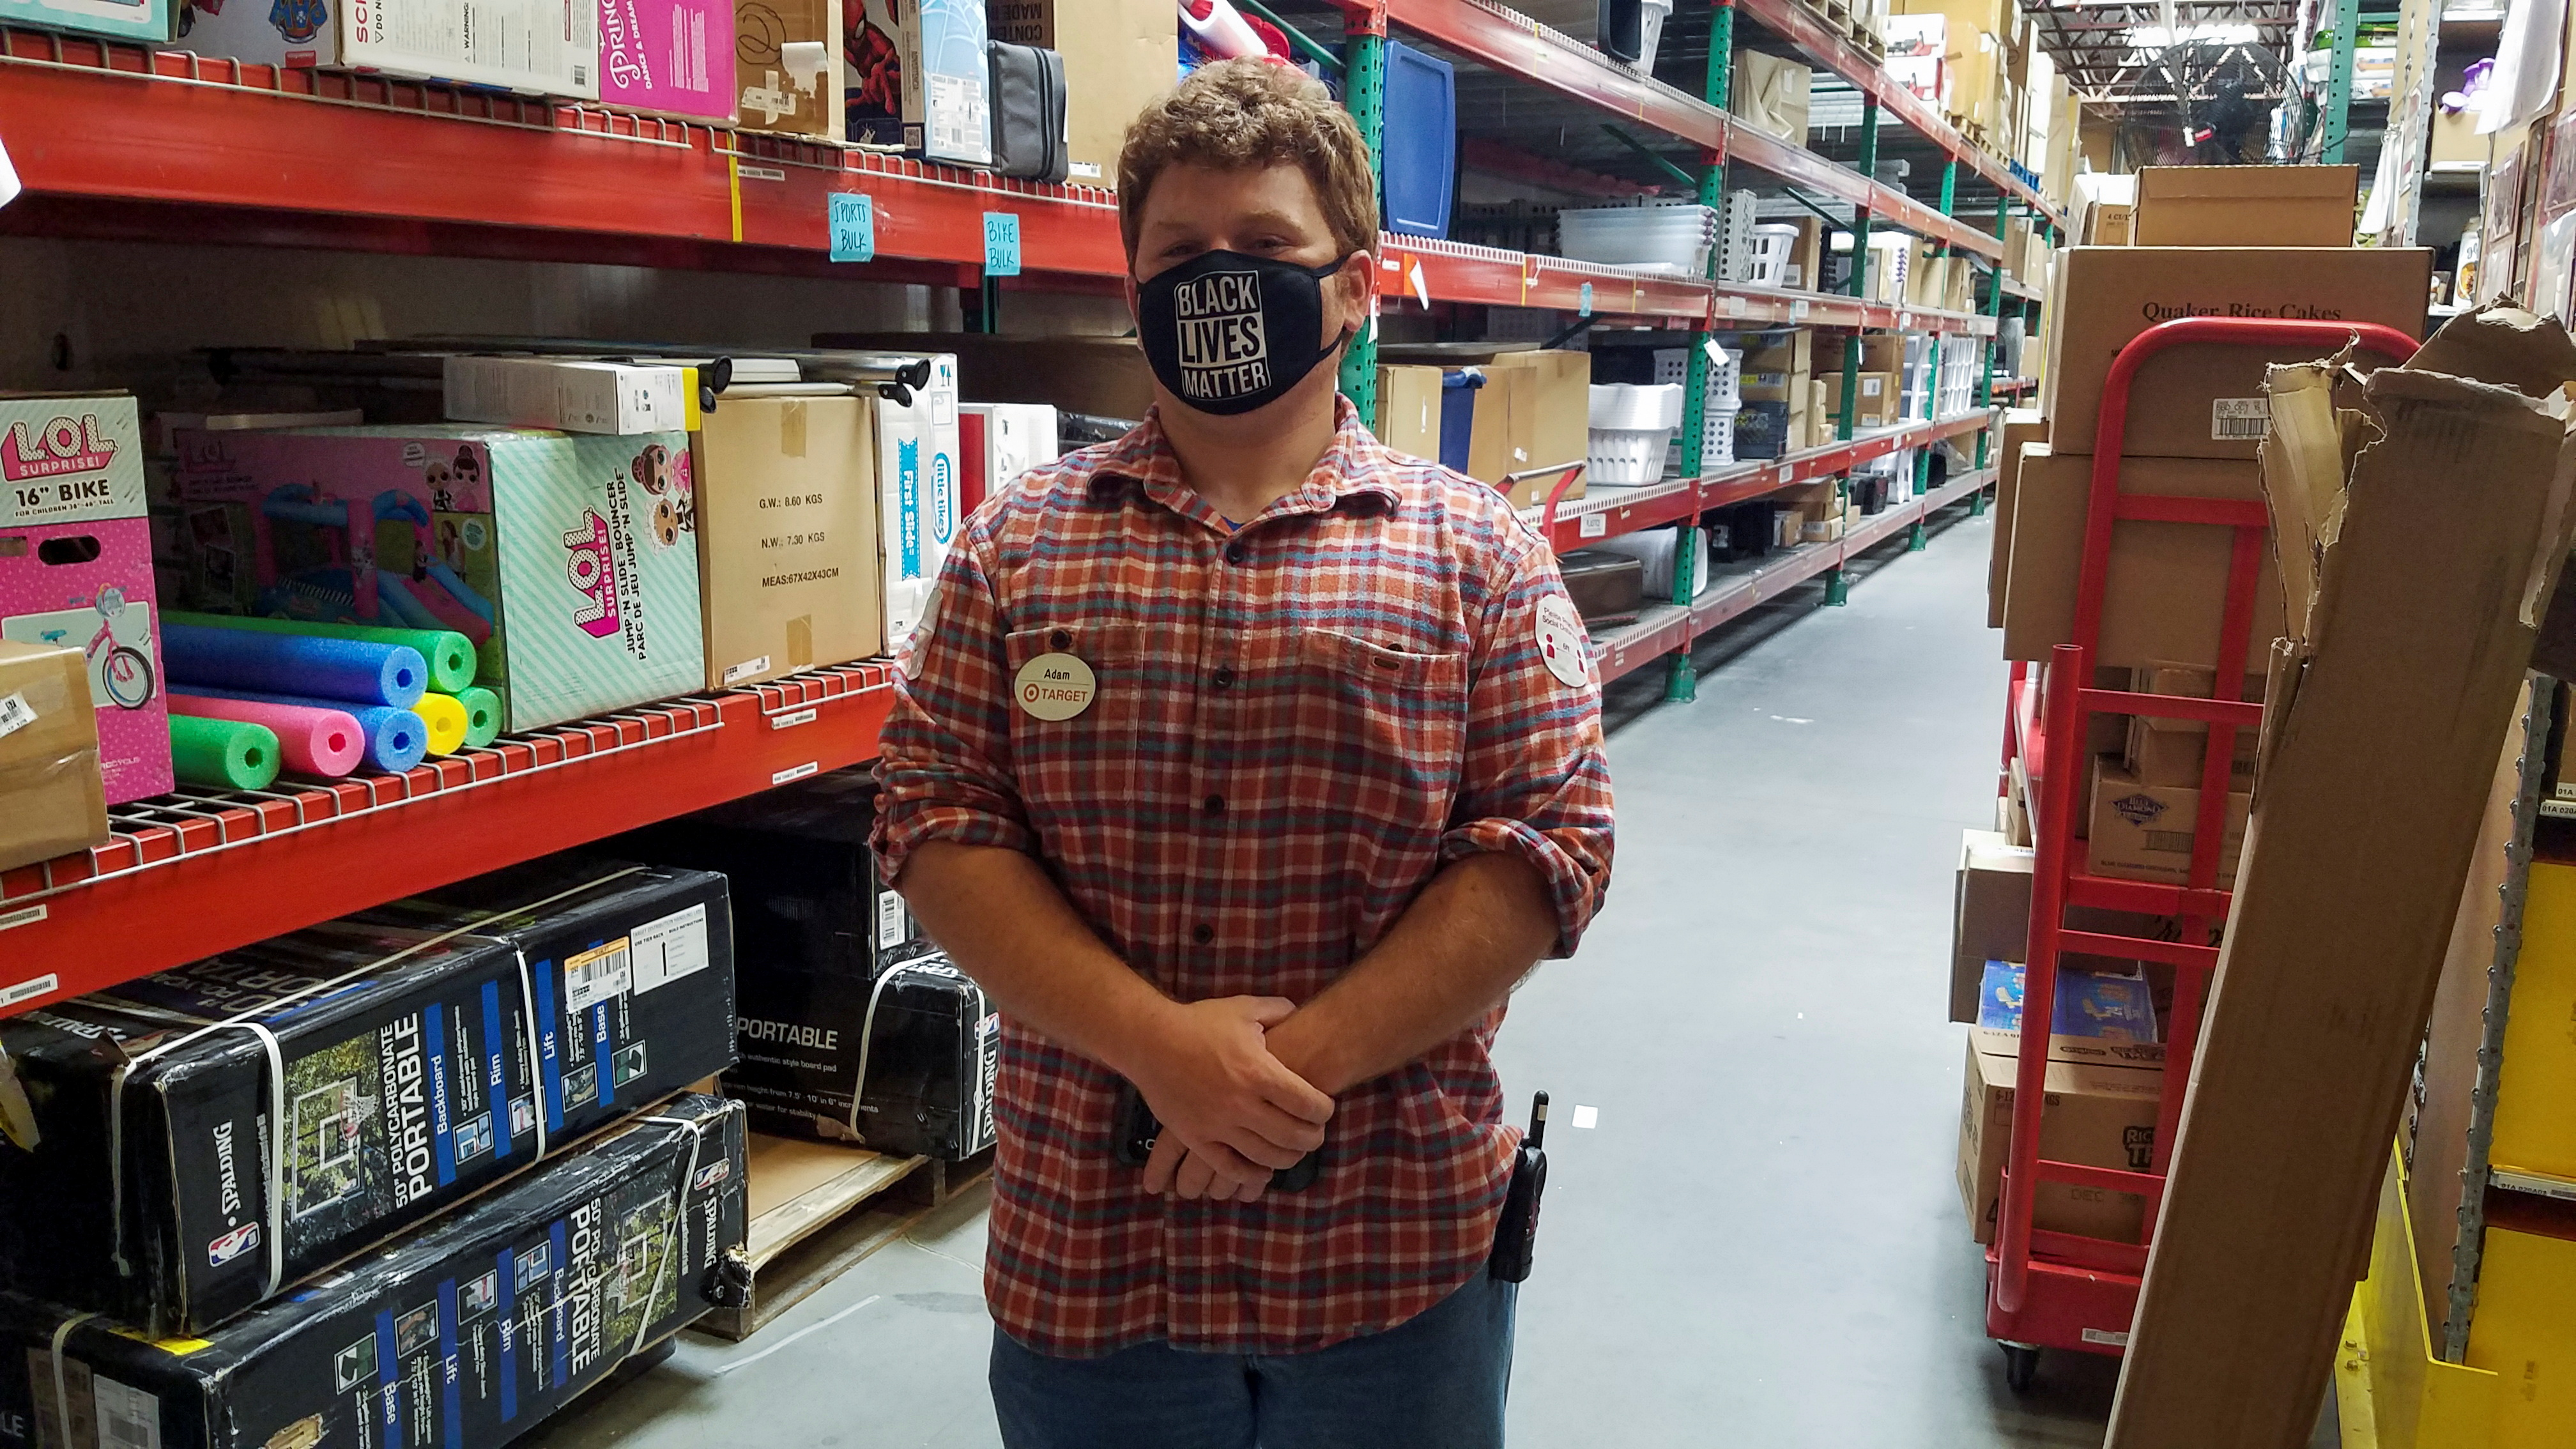 Target worker Adam Ryan stands in the stockroom of his store in Christiansburg, Virginia, U.S. May 10, 2021. Adam Ryan/Handout via REUTERS